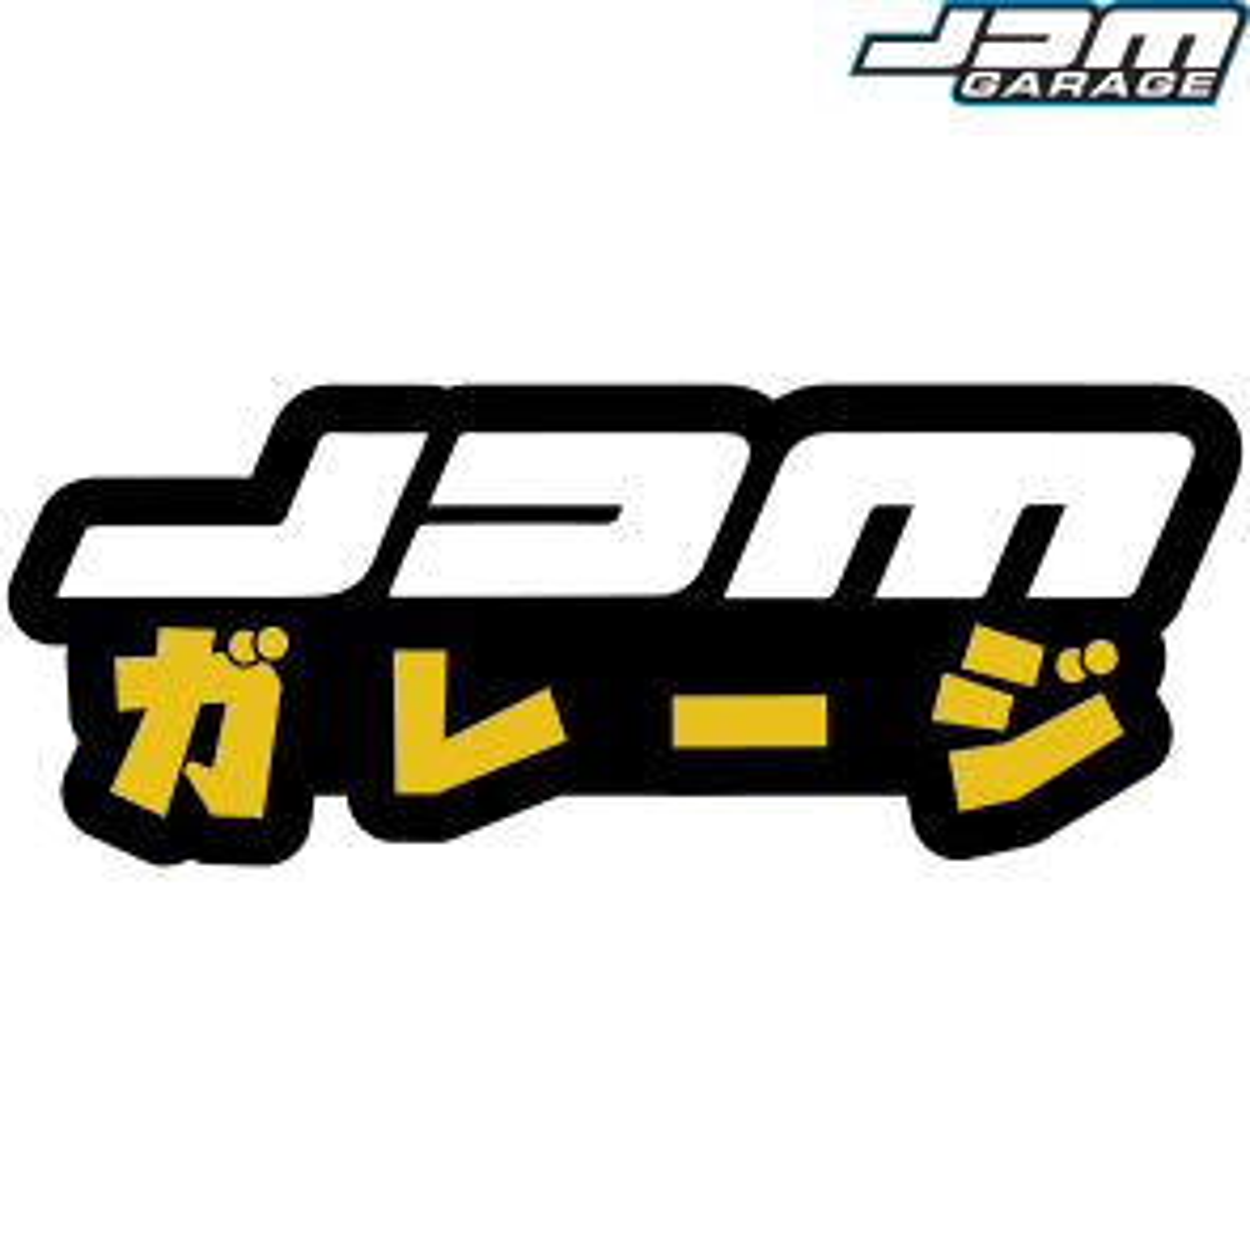 JDMGarageUK Black & Gold Sticker